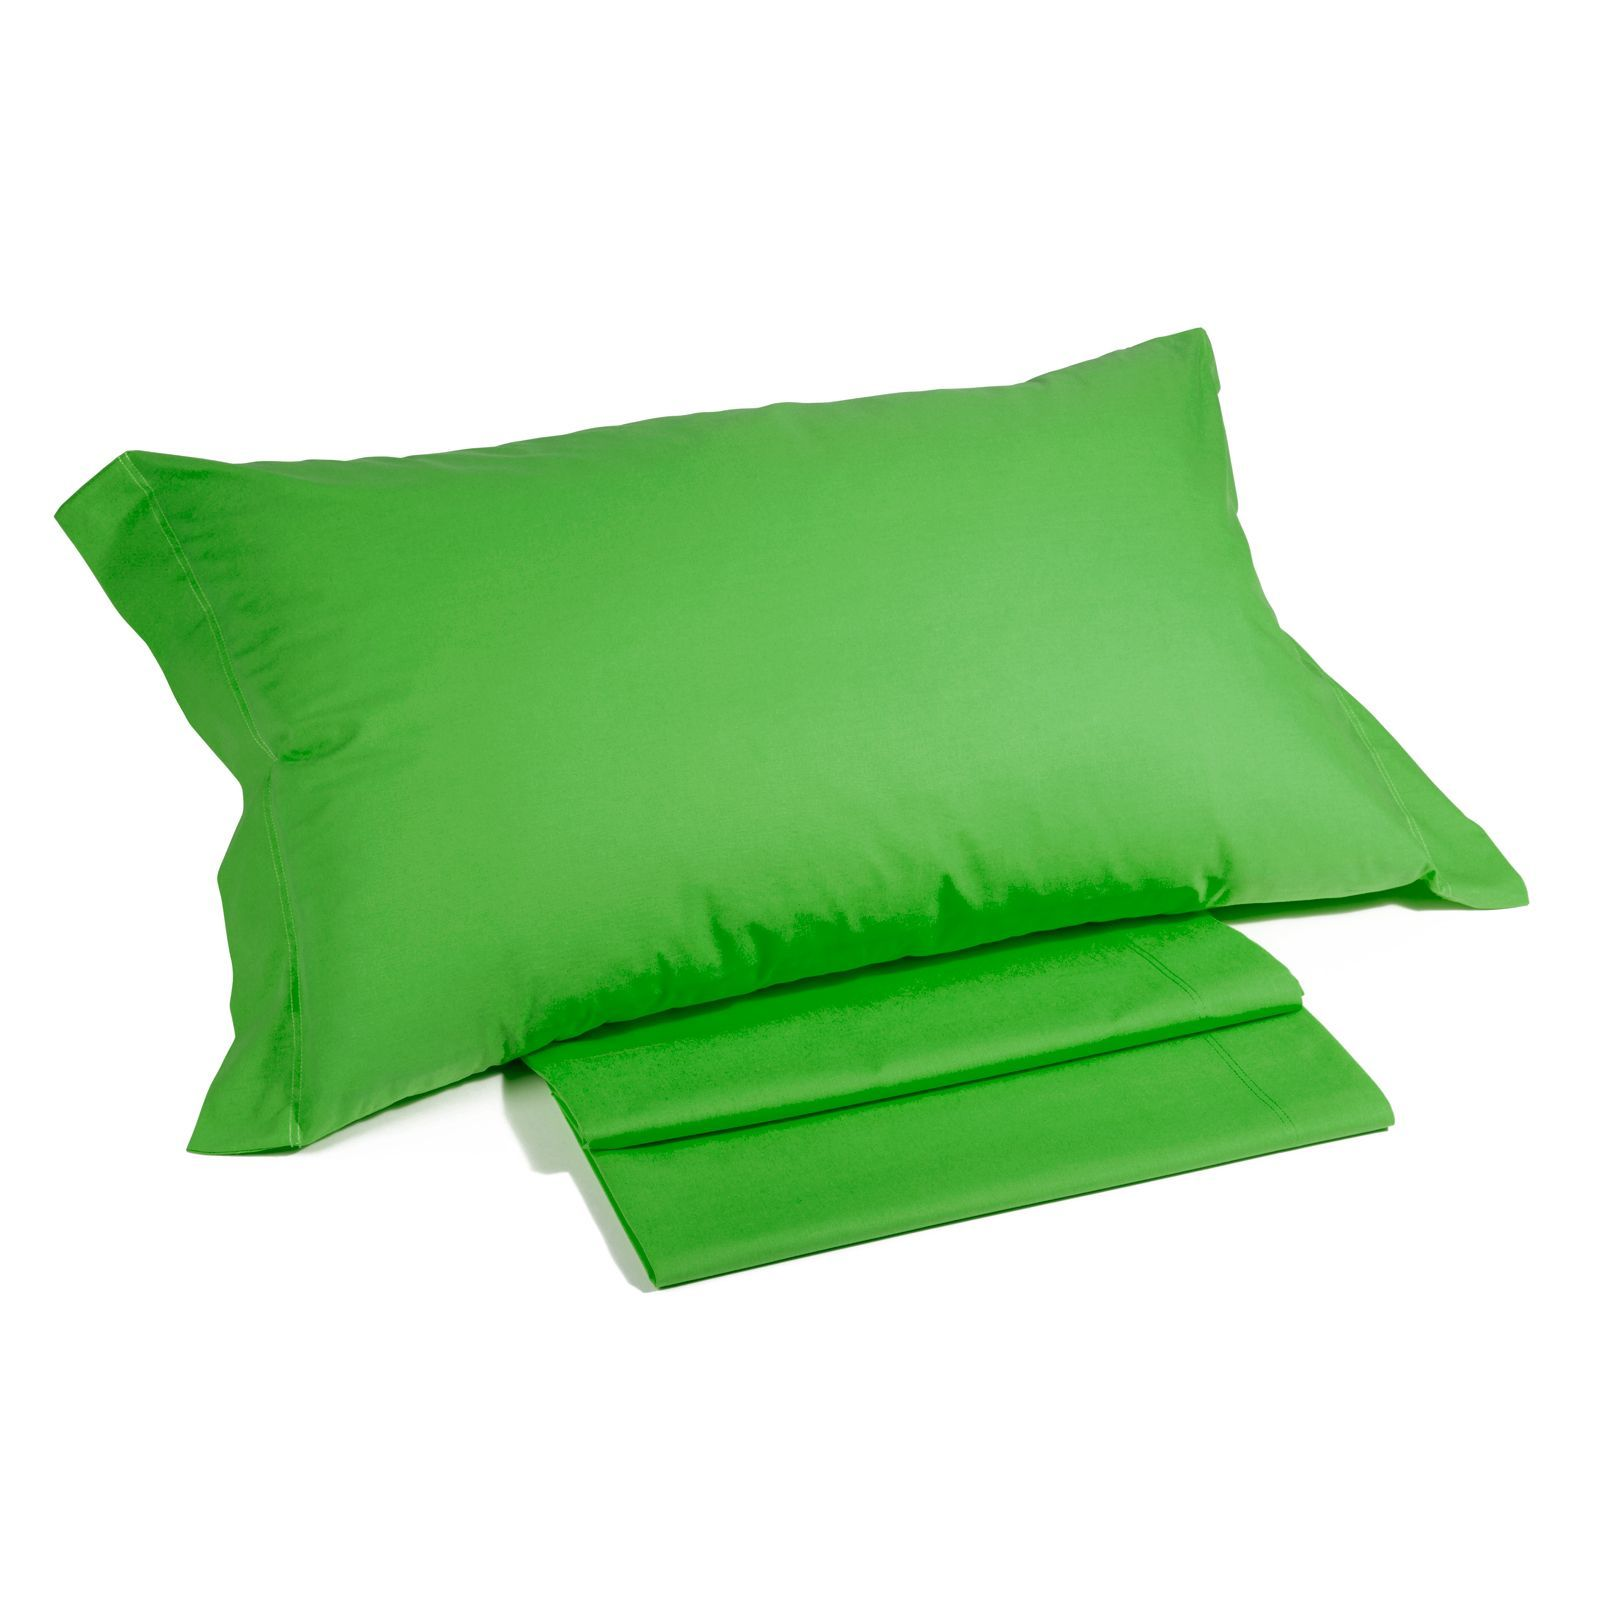 Для сна Наволочки 2шт 70х70 Caleffi Tinta Unita зеленые komplekt-navolochek-caleffi-tinta-unita-zelyonyy-italiya.jpg